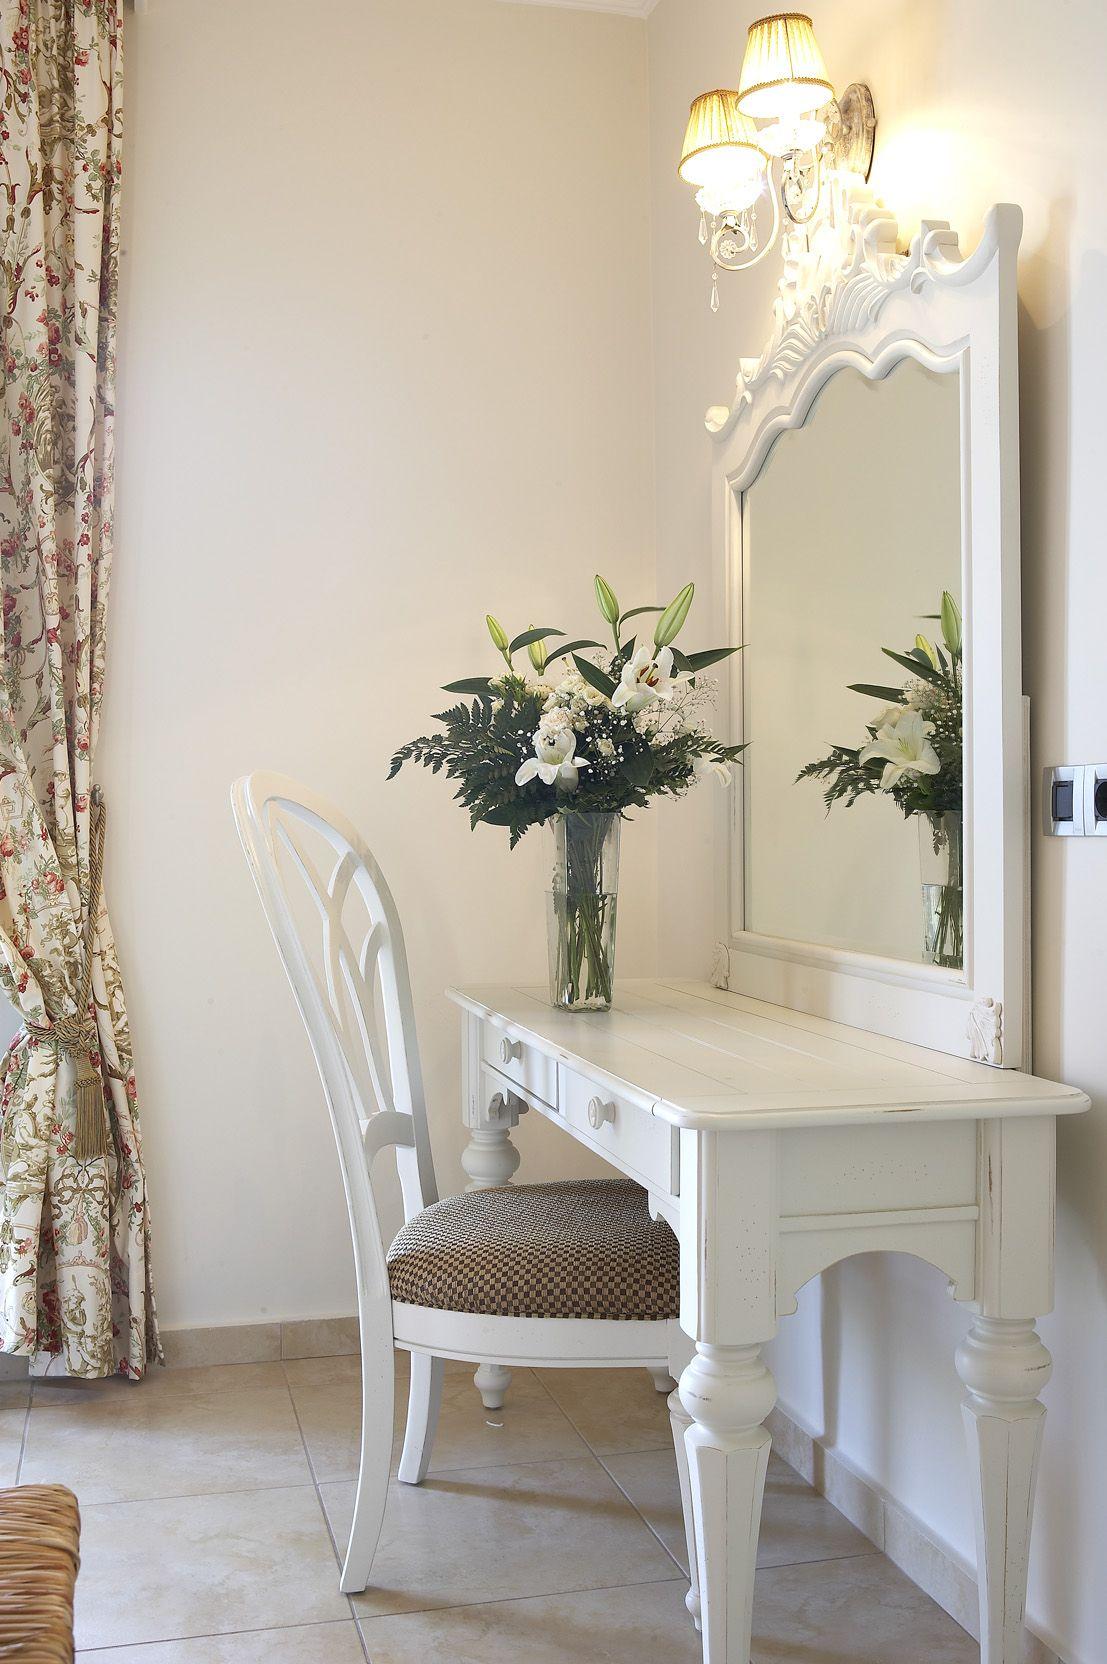 Boutique Hotel Bedrooms: Superior Ground Floor Room, Thalassa Boutique Hotel In